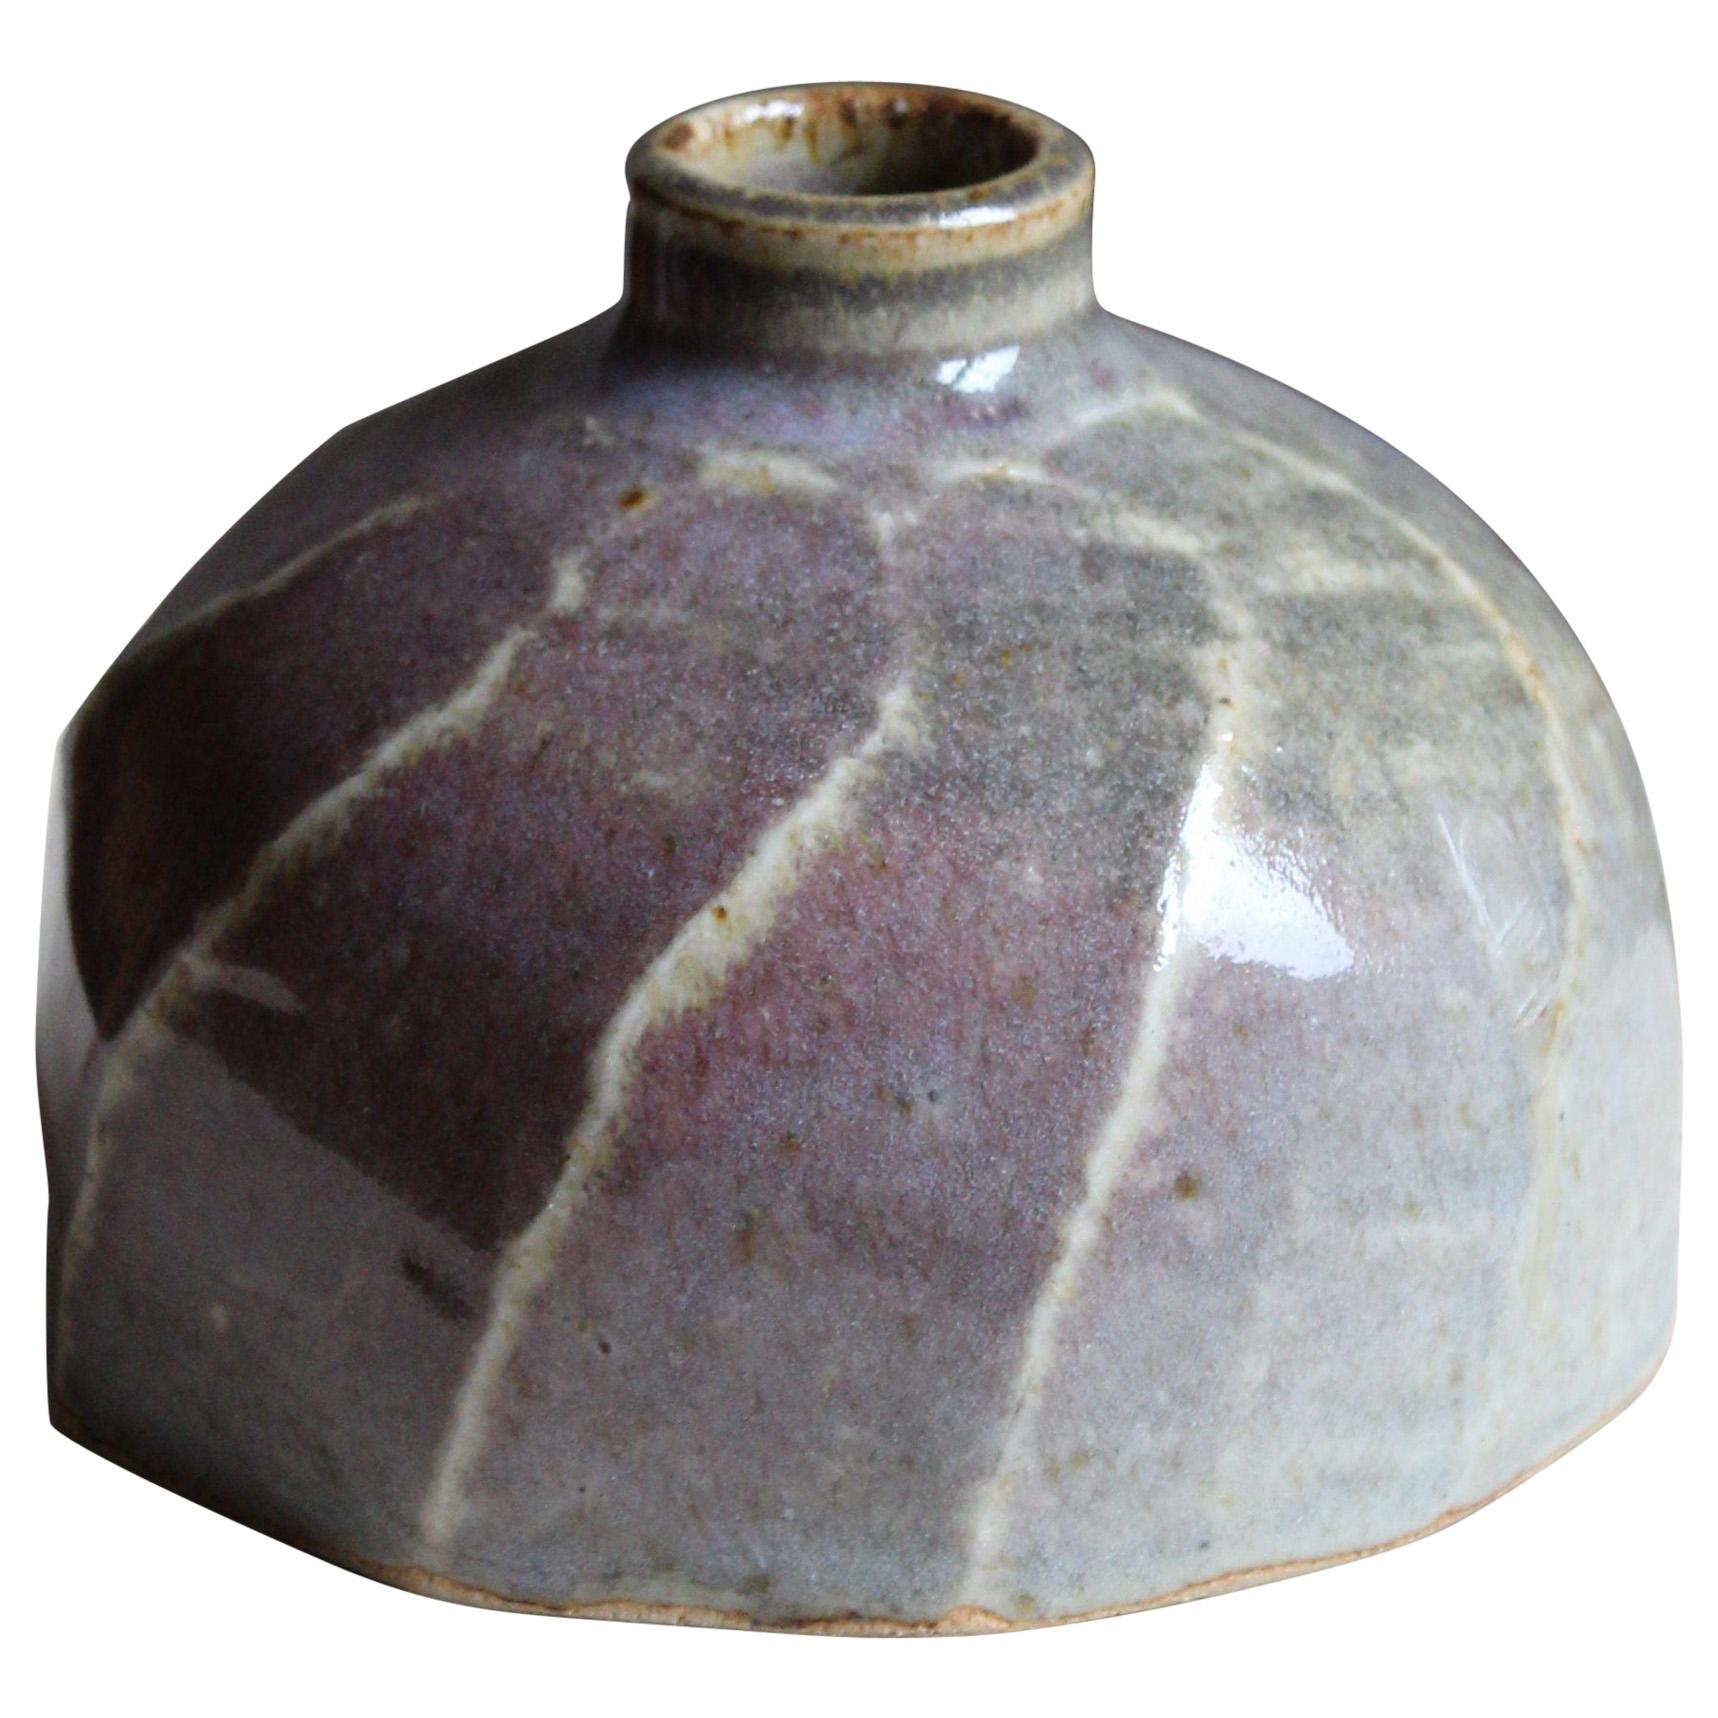 Annikki Hovisaari, Small Vase, Glazed Stoneware, Arabia, Finland, 1950s